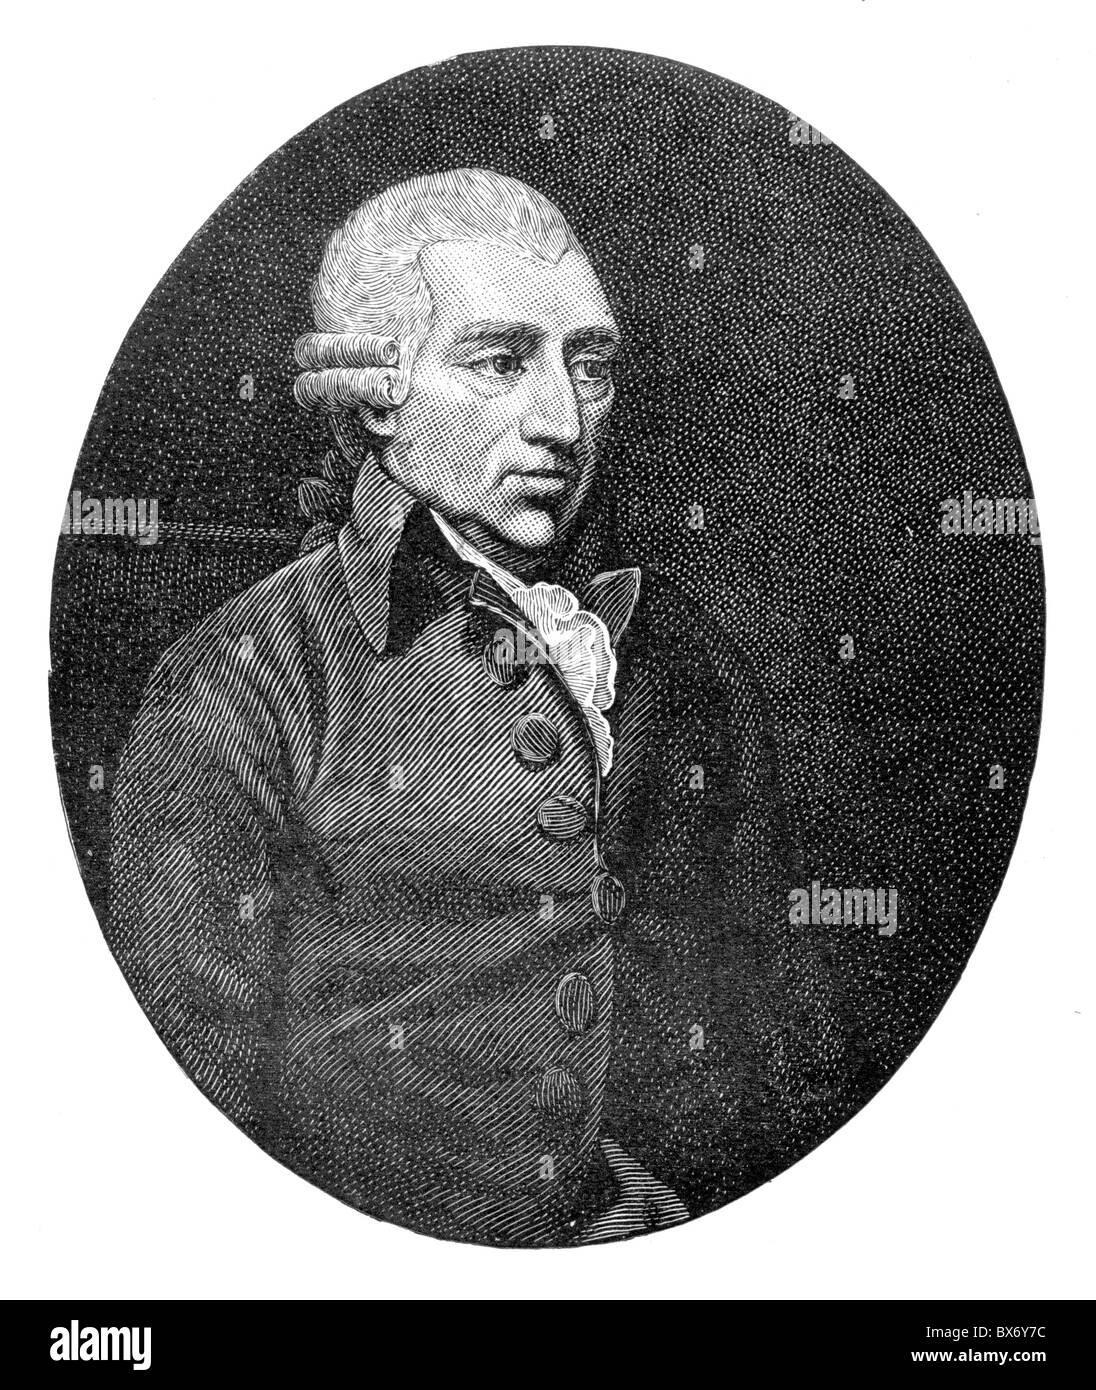 John Howard, English Prison Reformer 1789, Black and White Illustration; Stock Photo